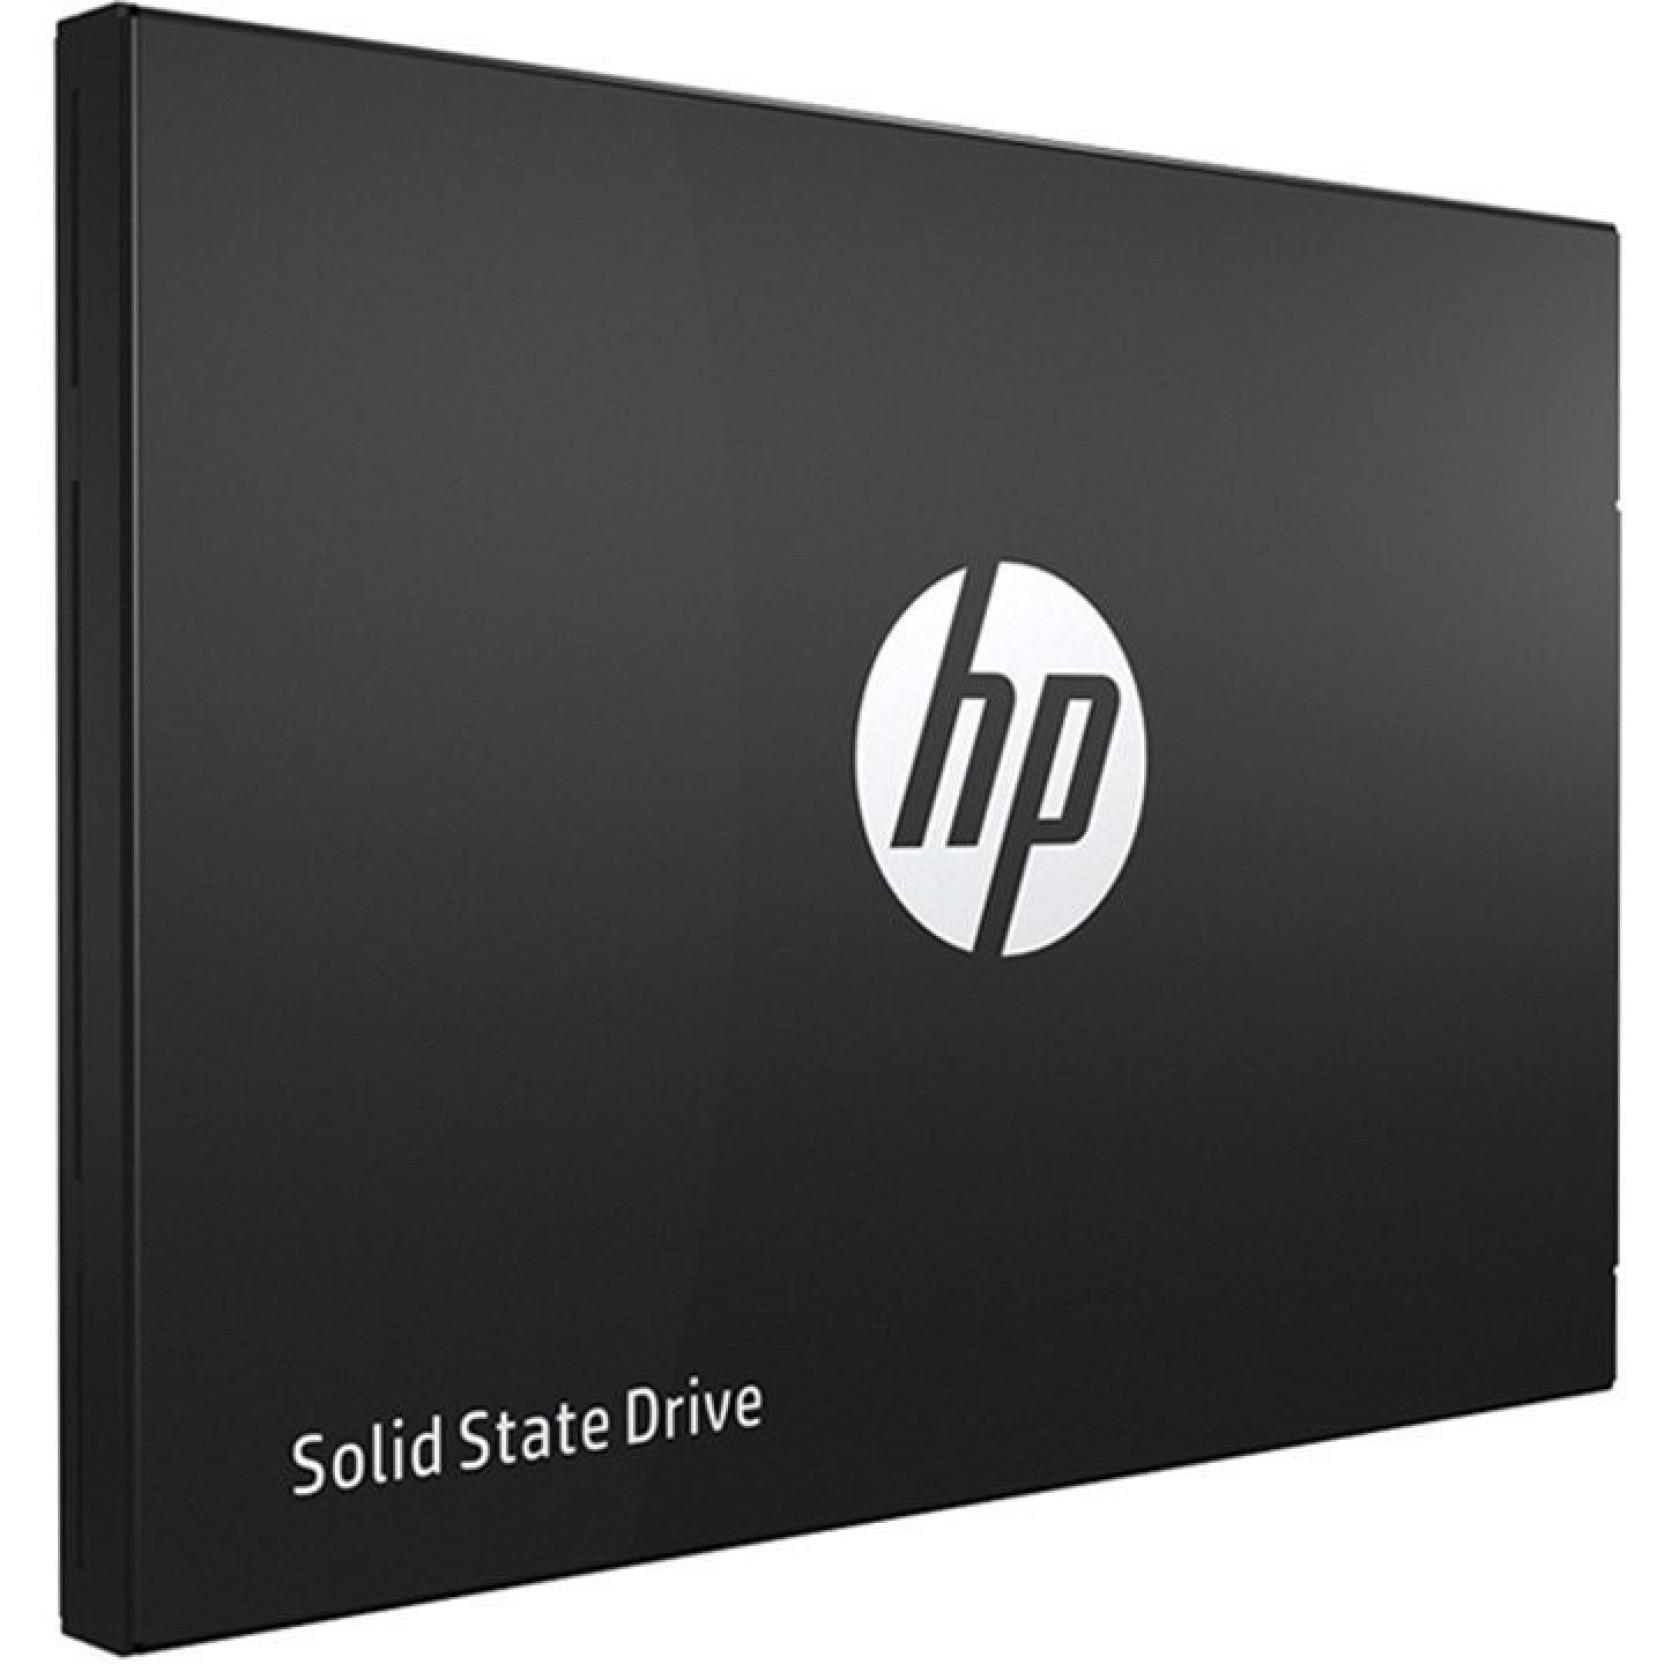 "Fotografie Solid-State Drive (SSD) HP S700, 250GB, 2.5"", SATA III"